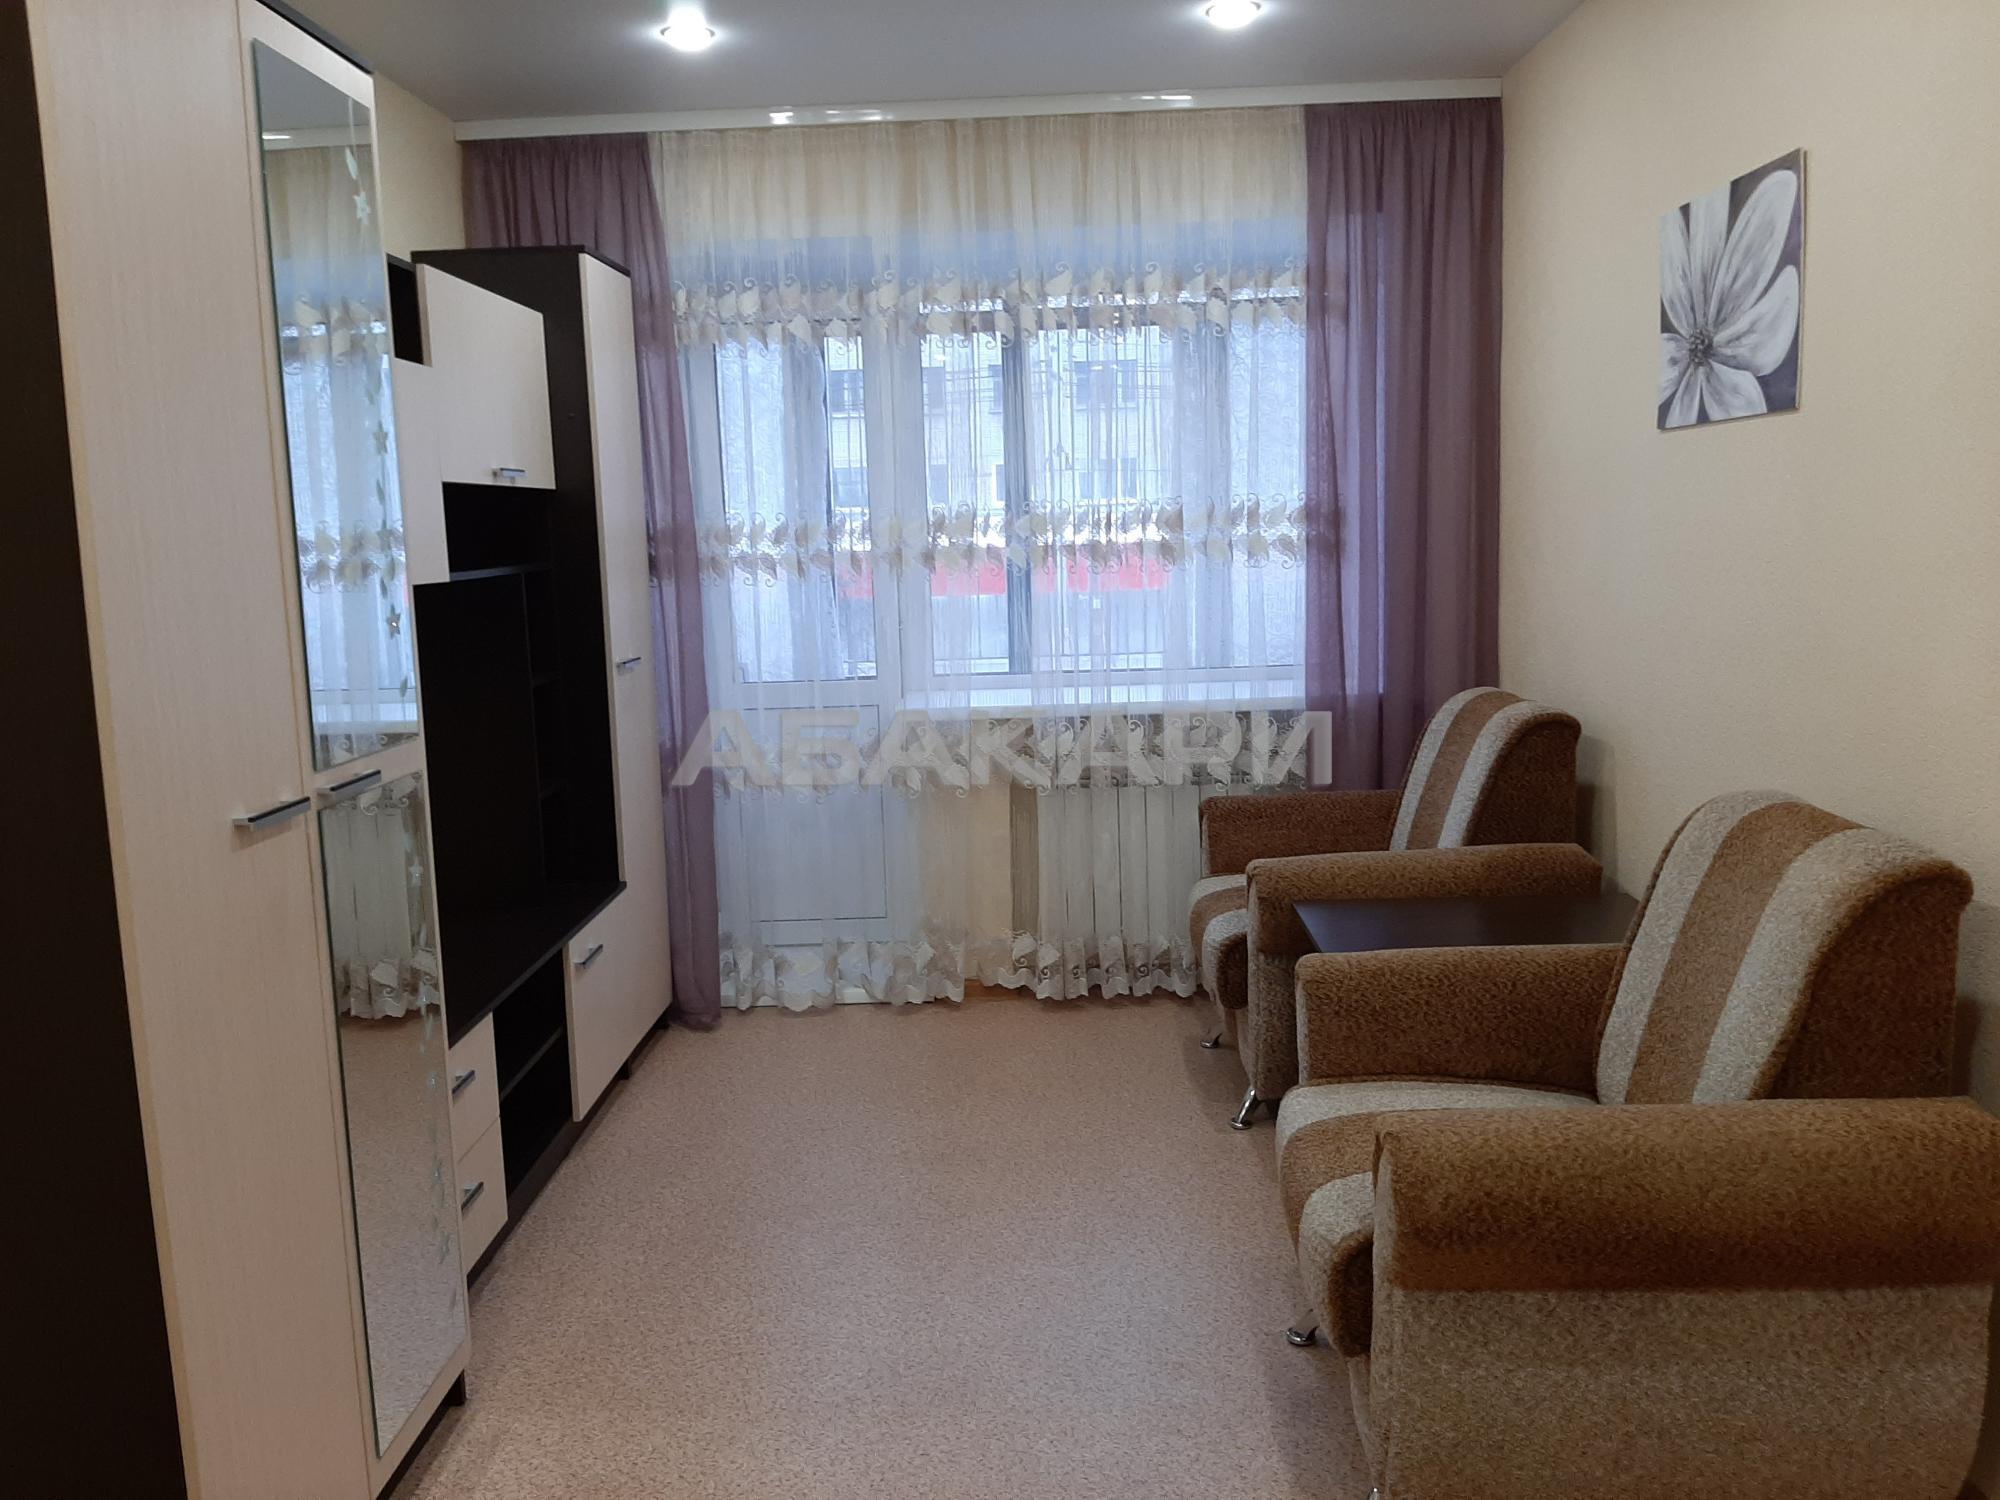 1к квартира городской округ улица Карла Маркса, 92   18000   аренда в Красноярске фото 6